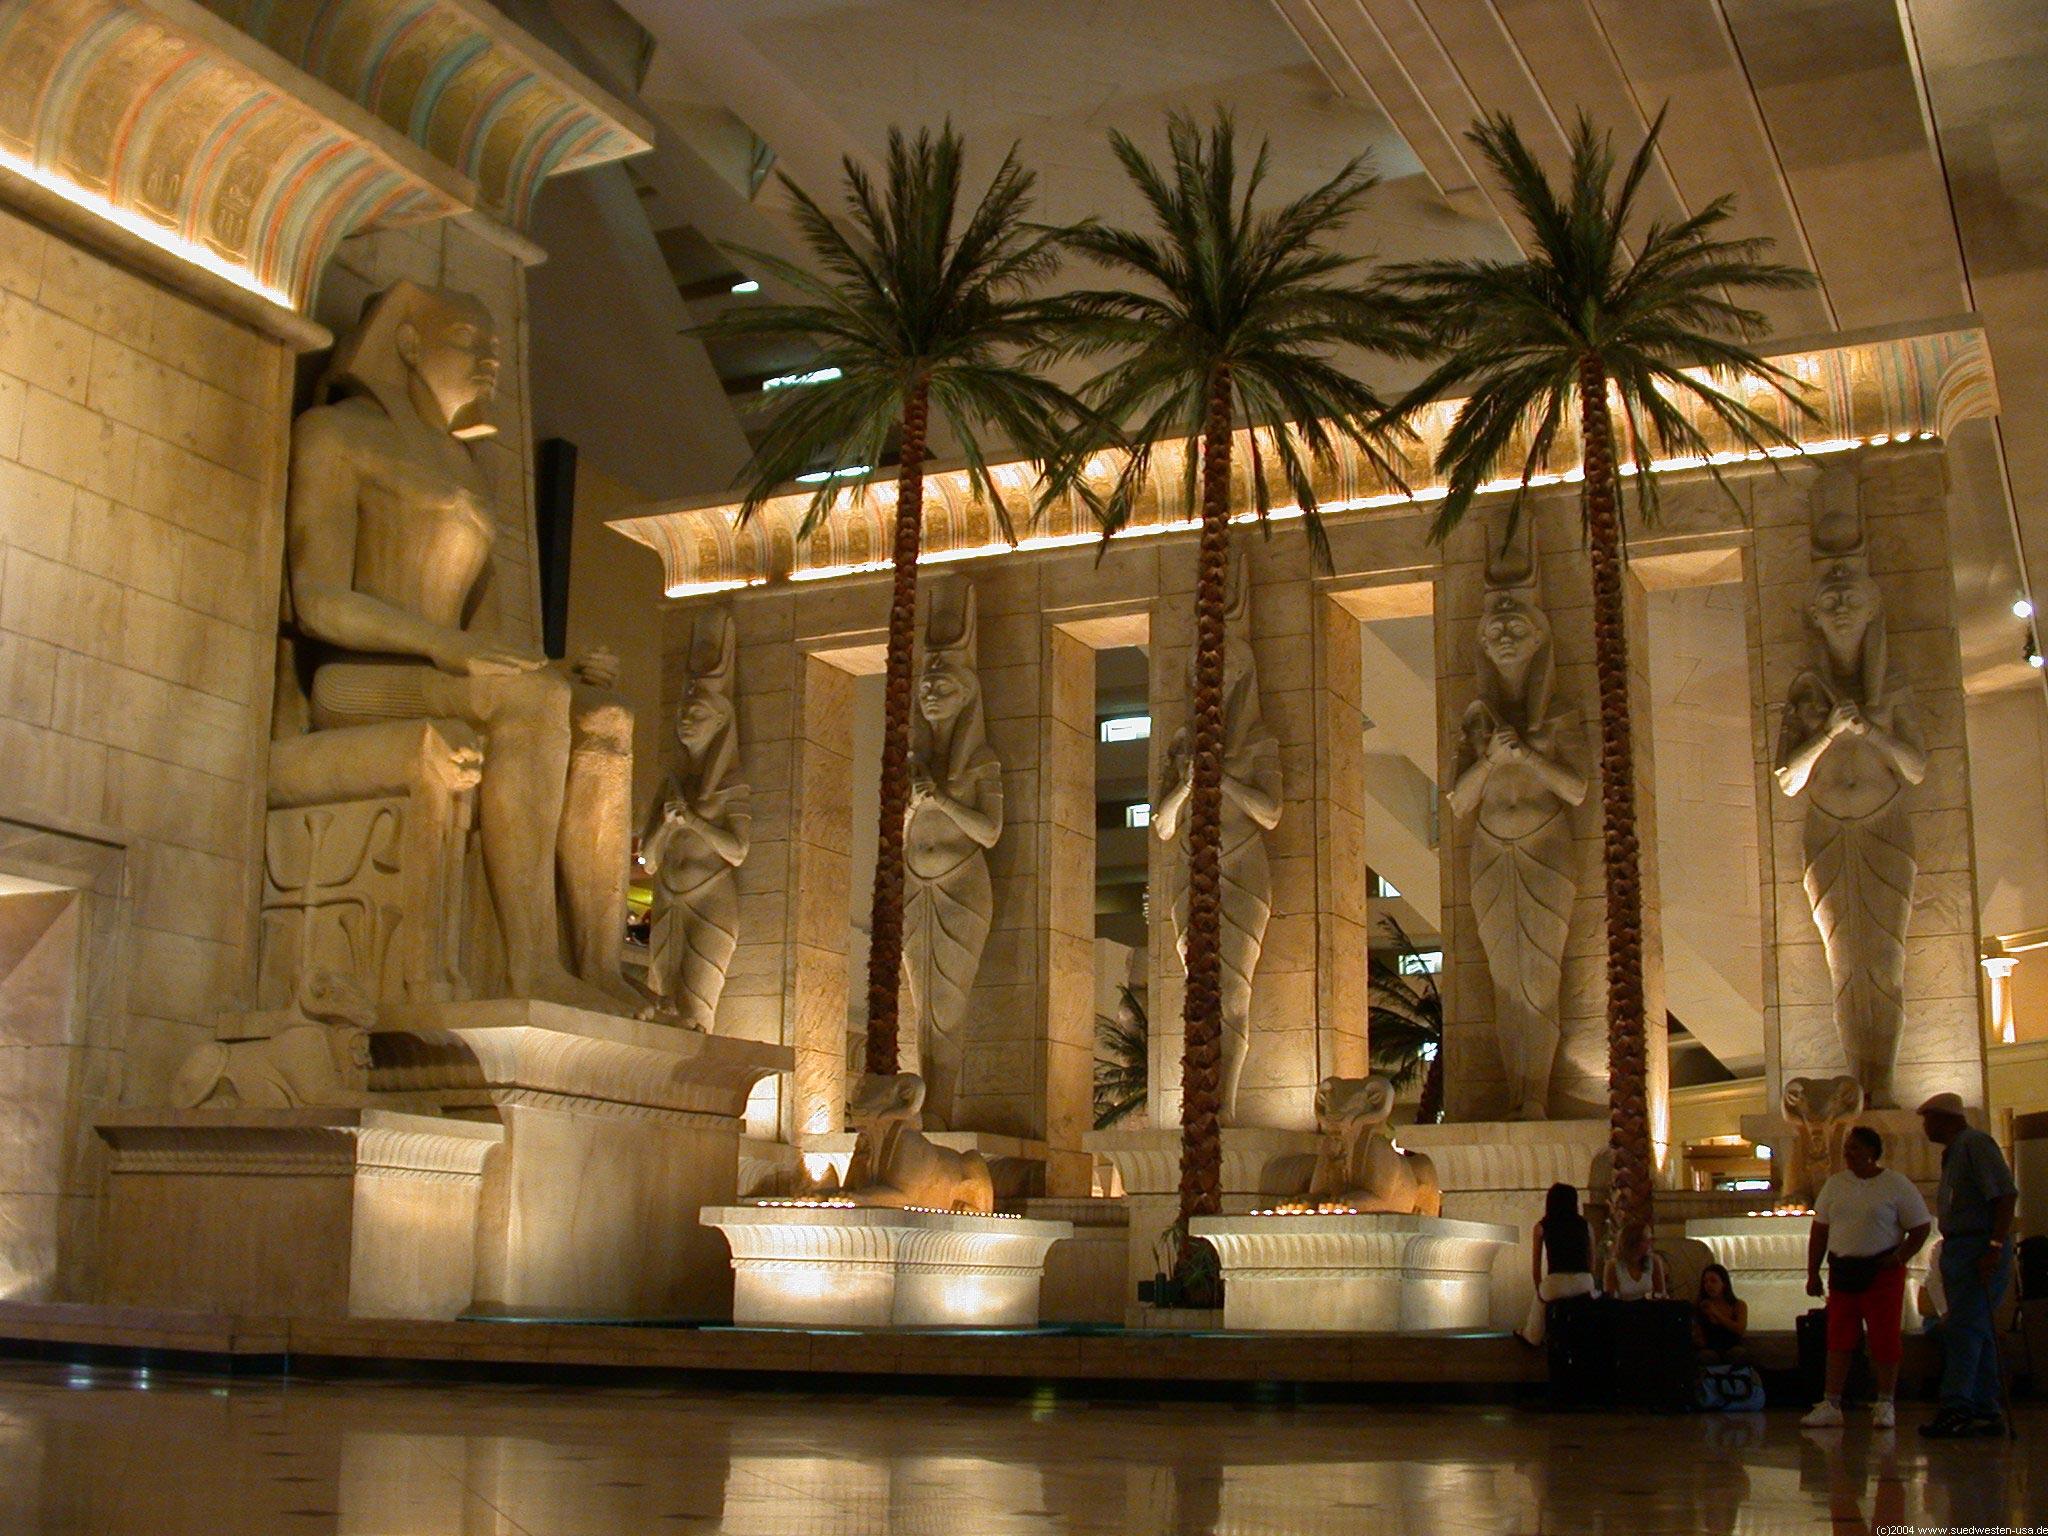 Ägyptisches badezimmer | vitaplaza, Badezimmer ideen